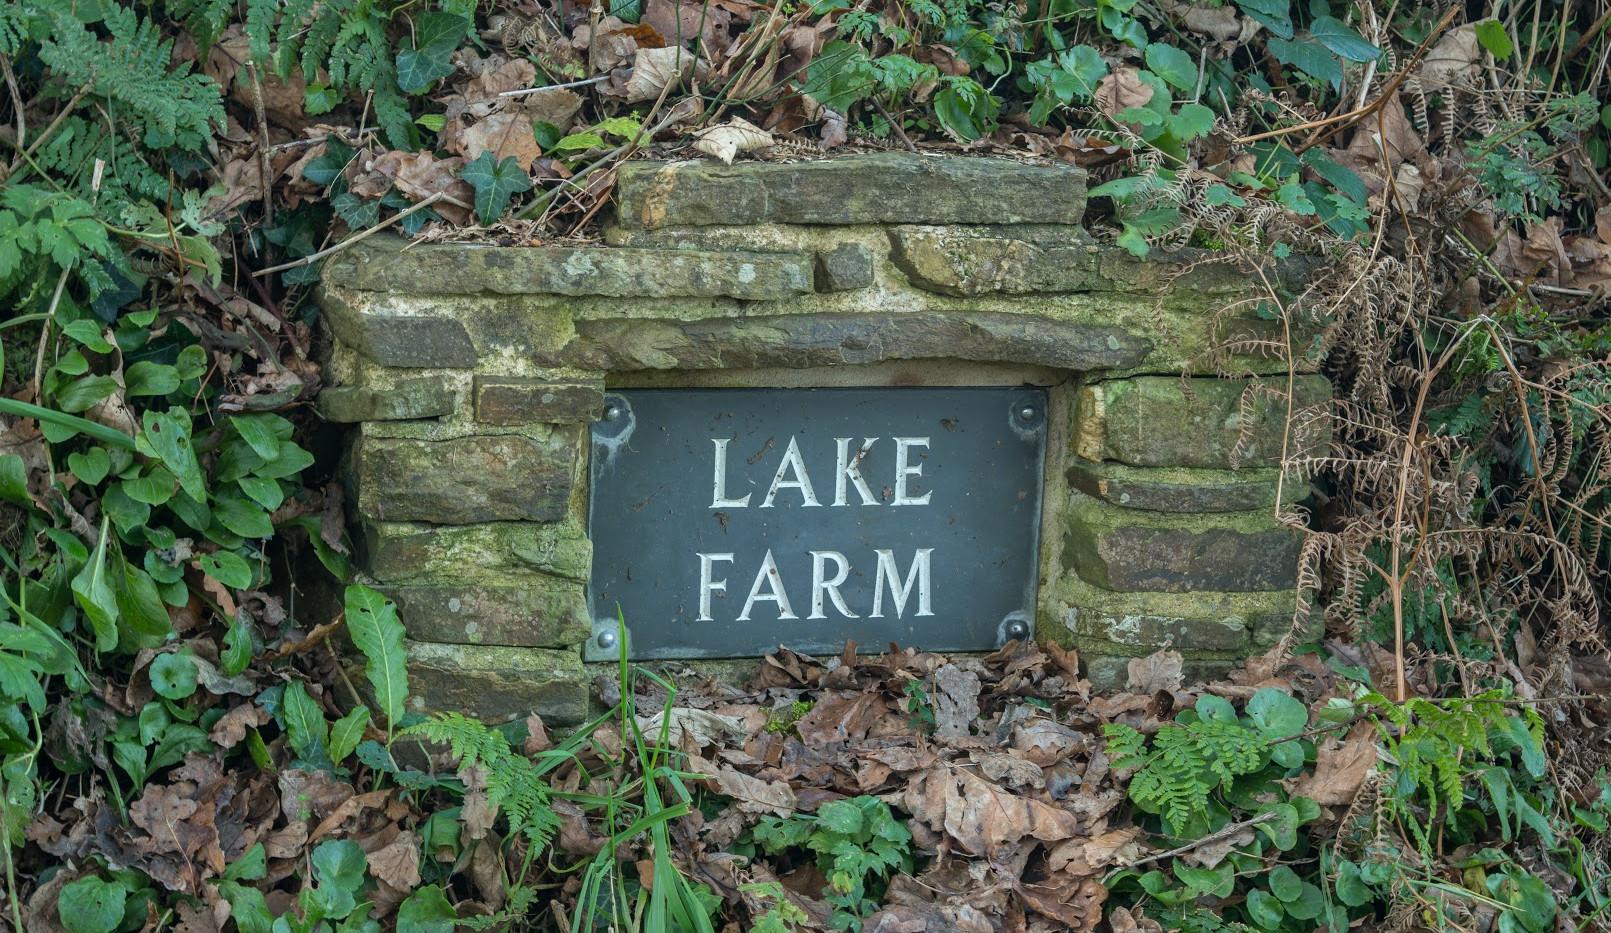 Lake Farm sign